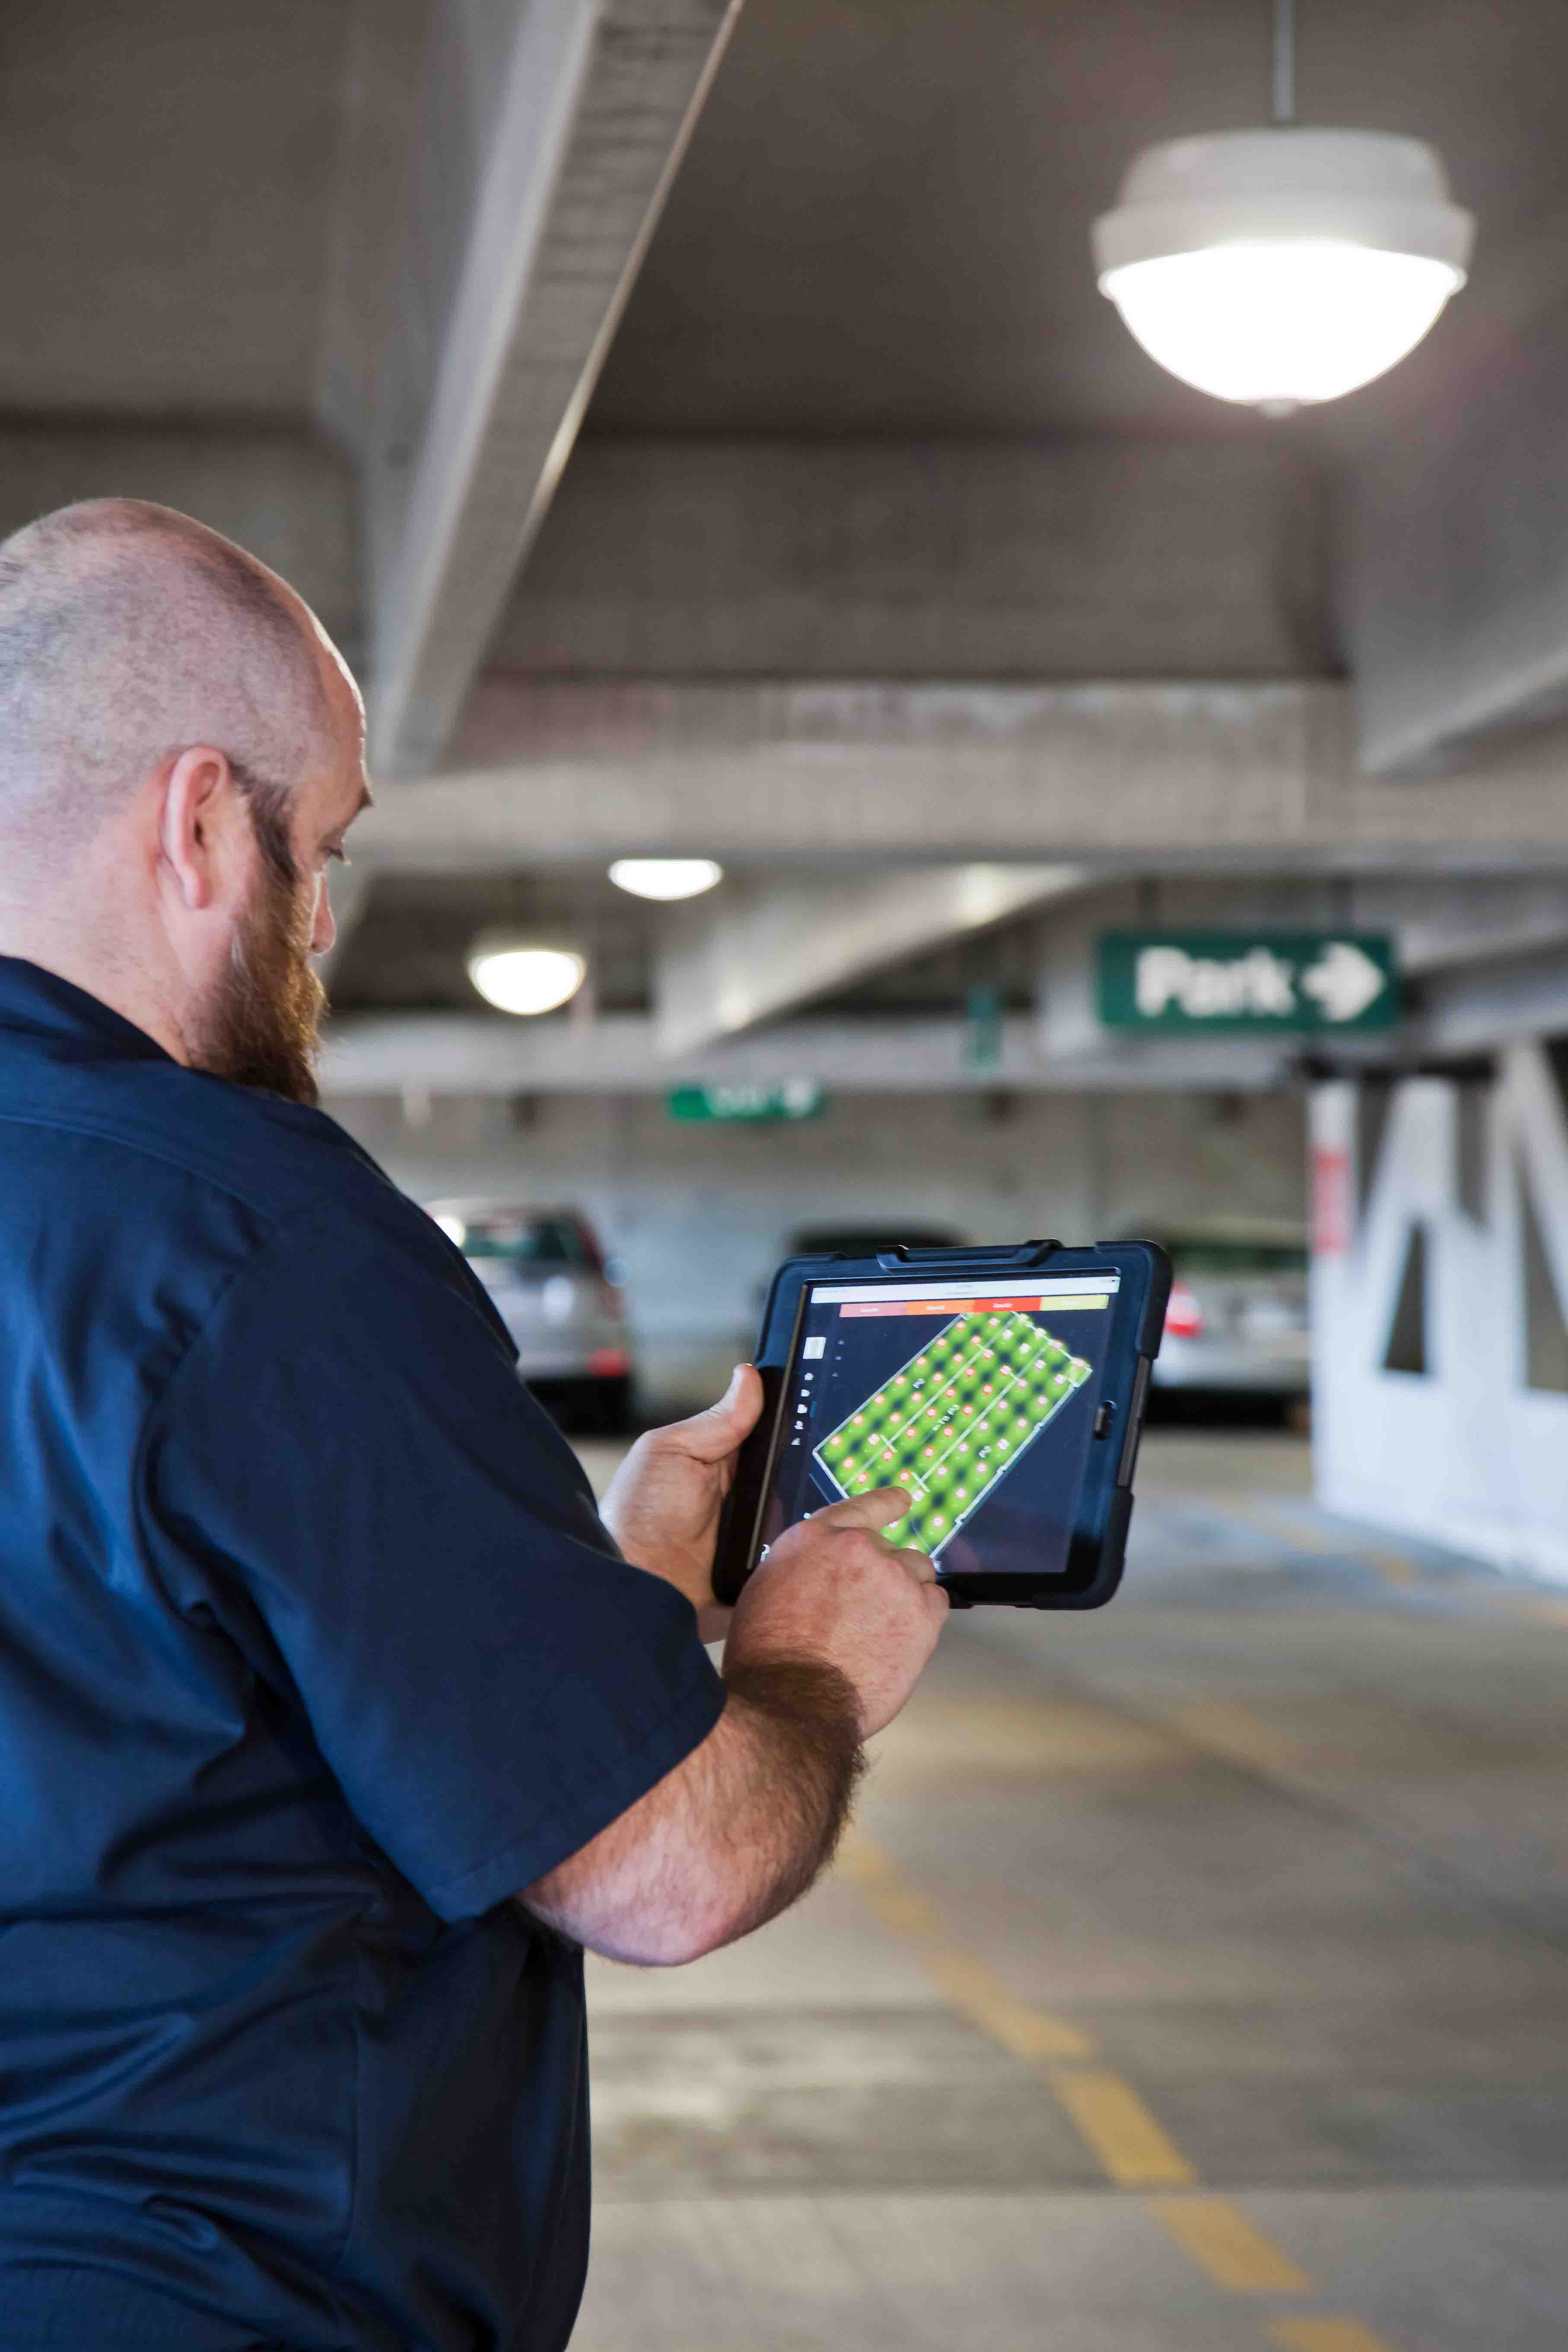 Kenall S Tekdek High Output Parking Luminaire Selected